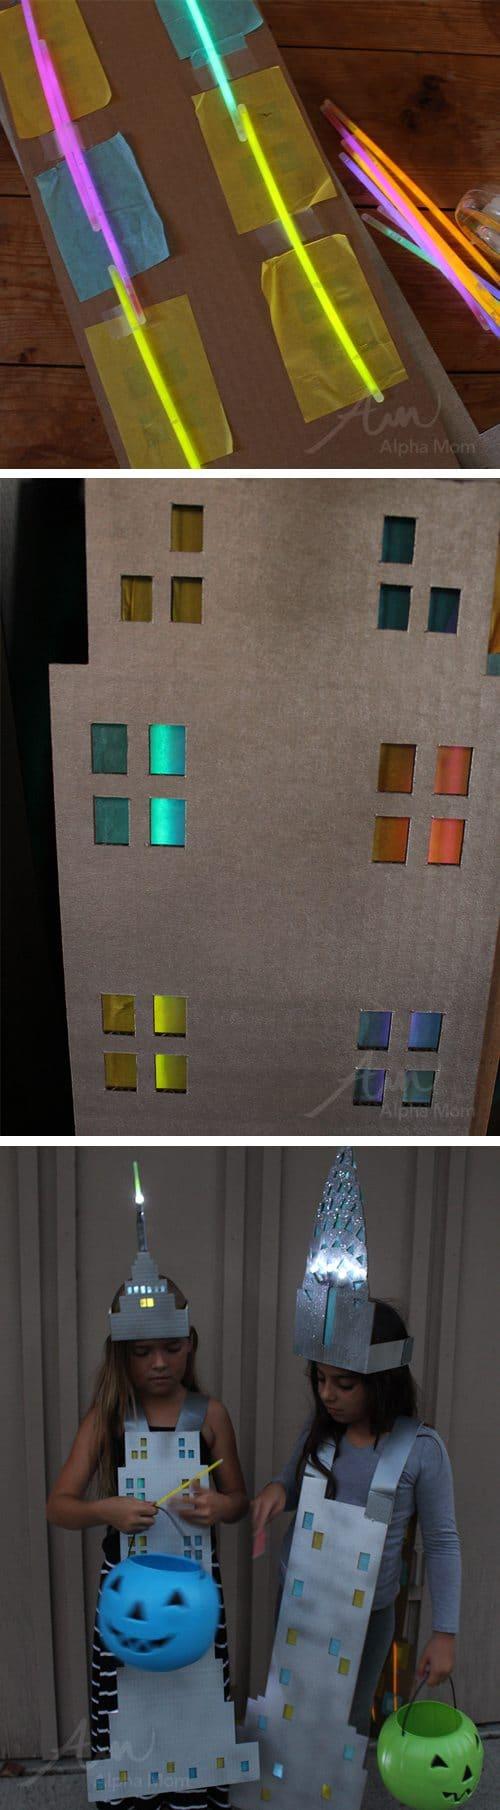 Chrysler Building Costume (adding glow stick tutorial) by Brenda Ponnay for Alphamom.com